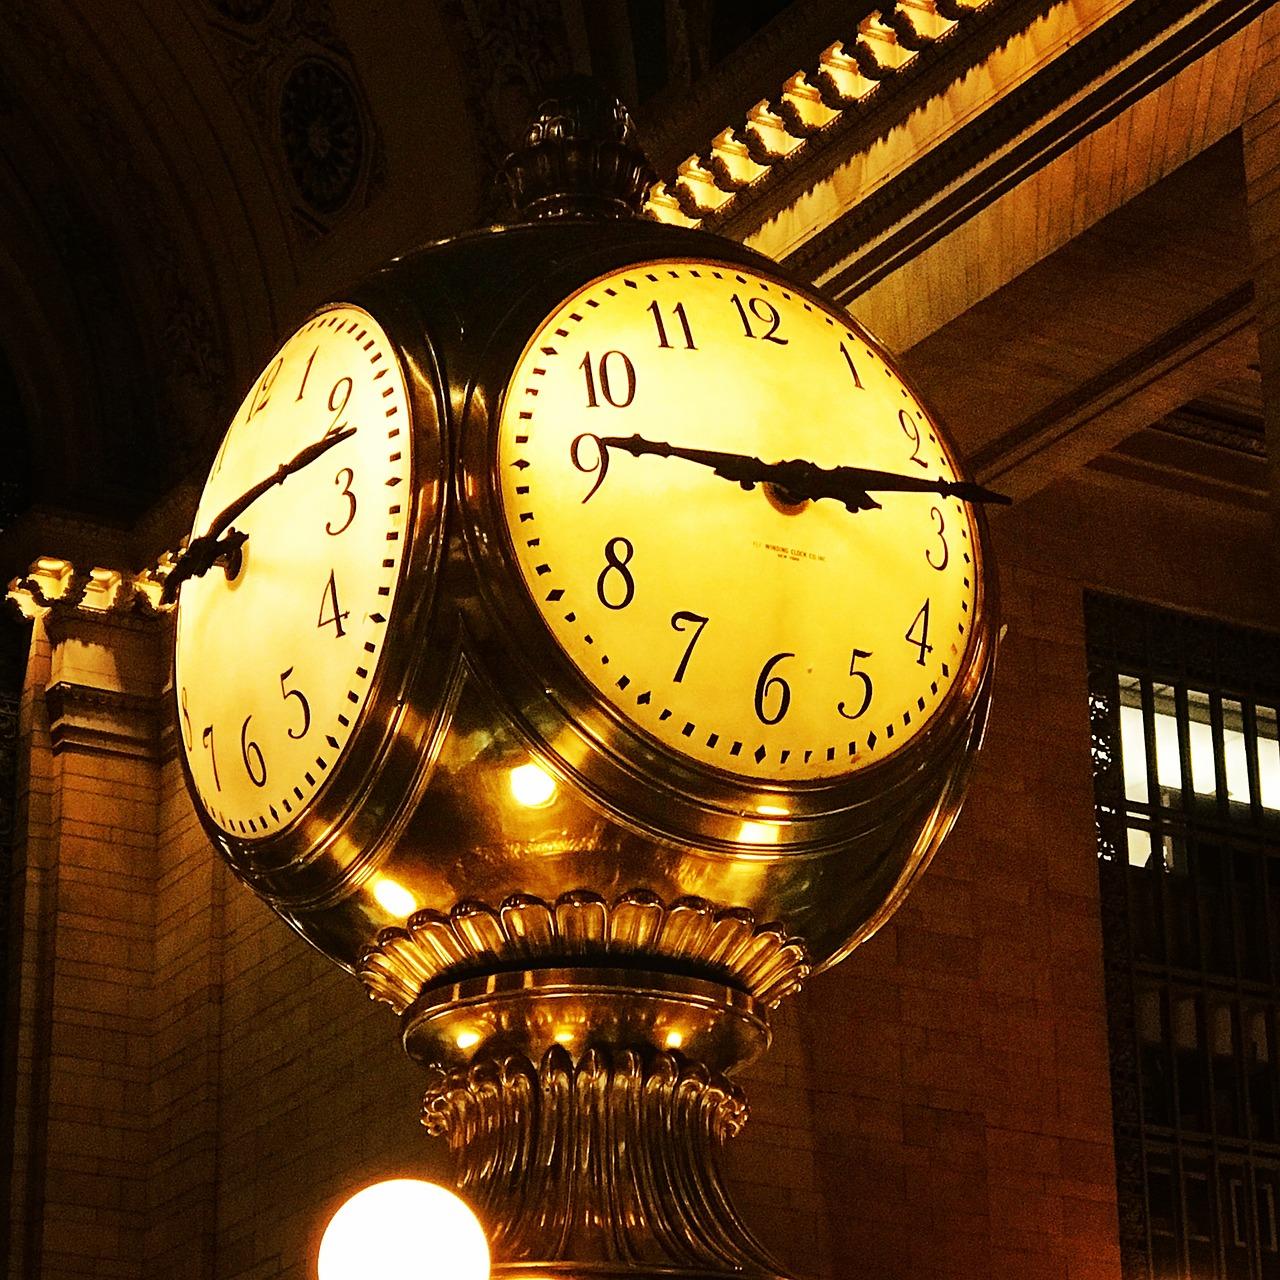 Time,new york,newyork,tourism,usa - free image from needpix.